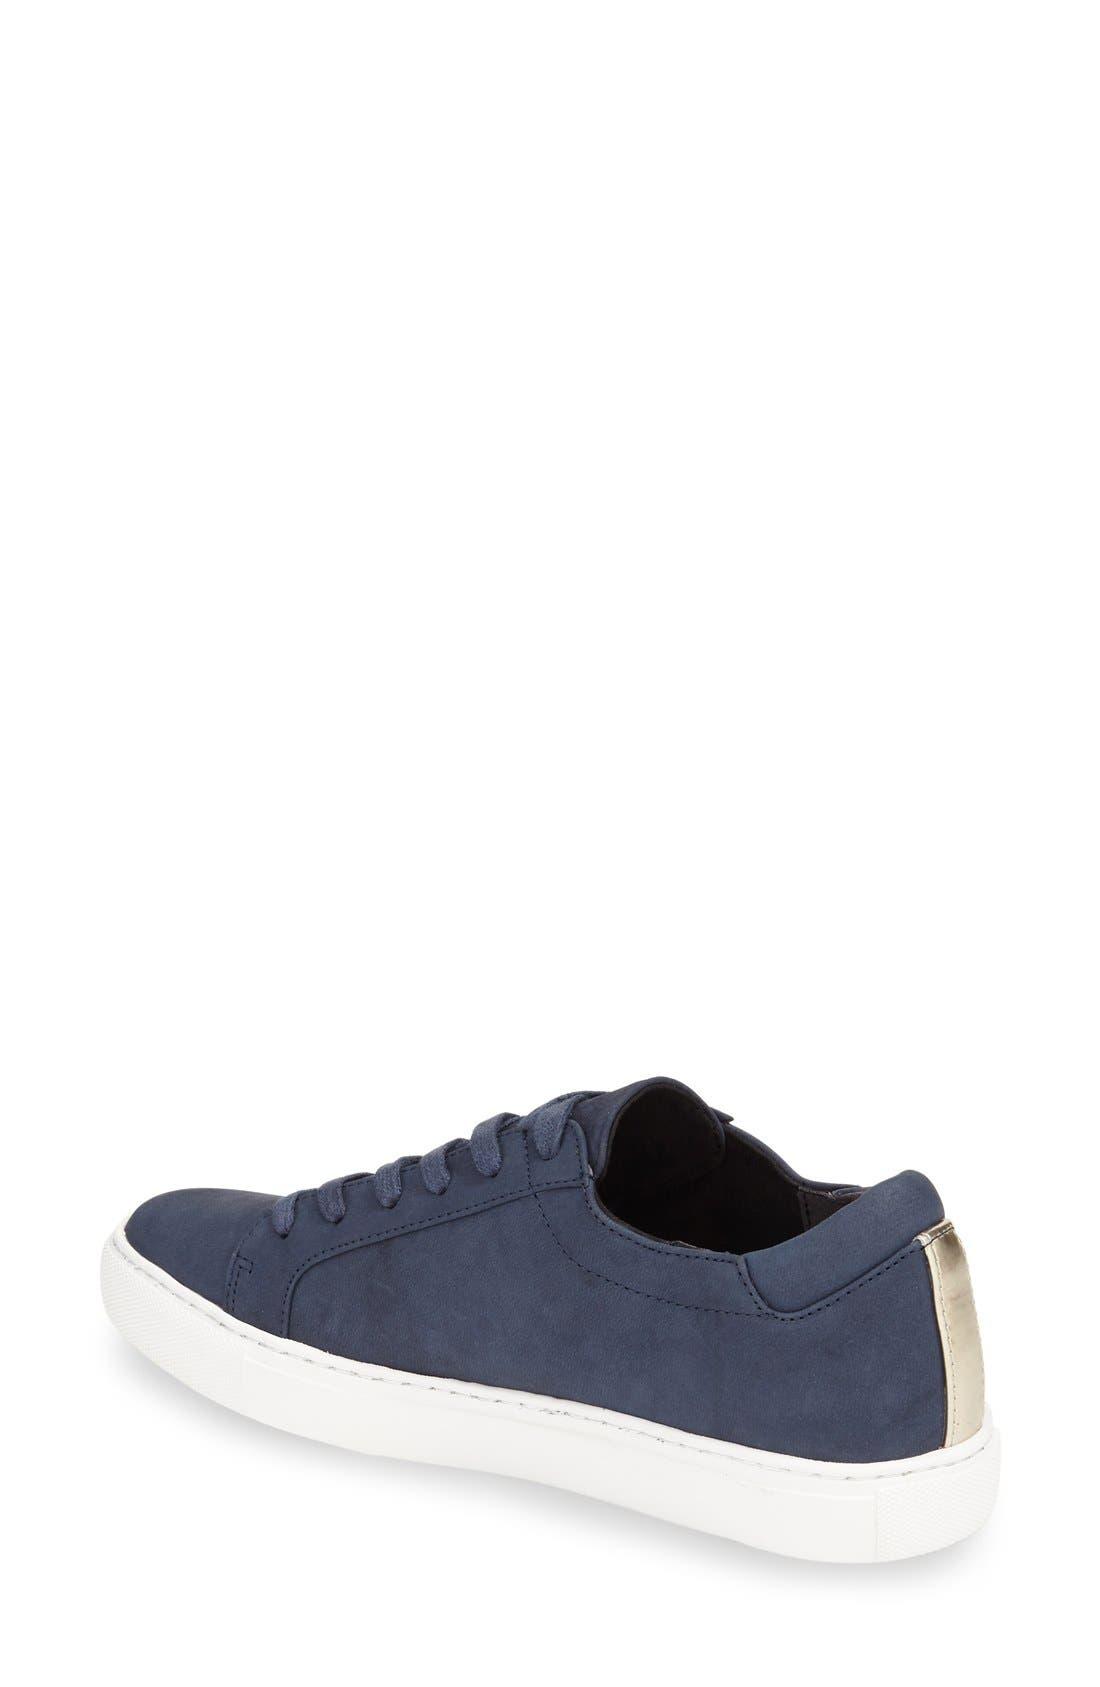 'Kam' Sneaker,                             Alternate thumbnail 2, color,                             Navy Nubuck Leather